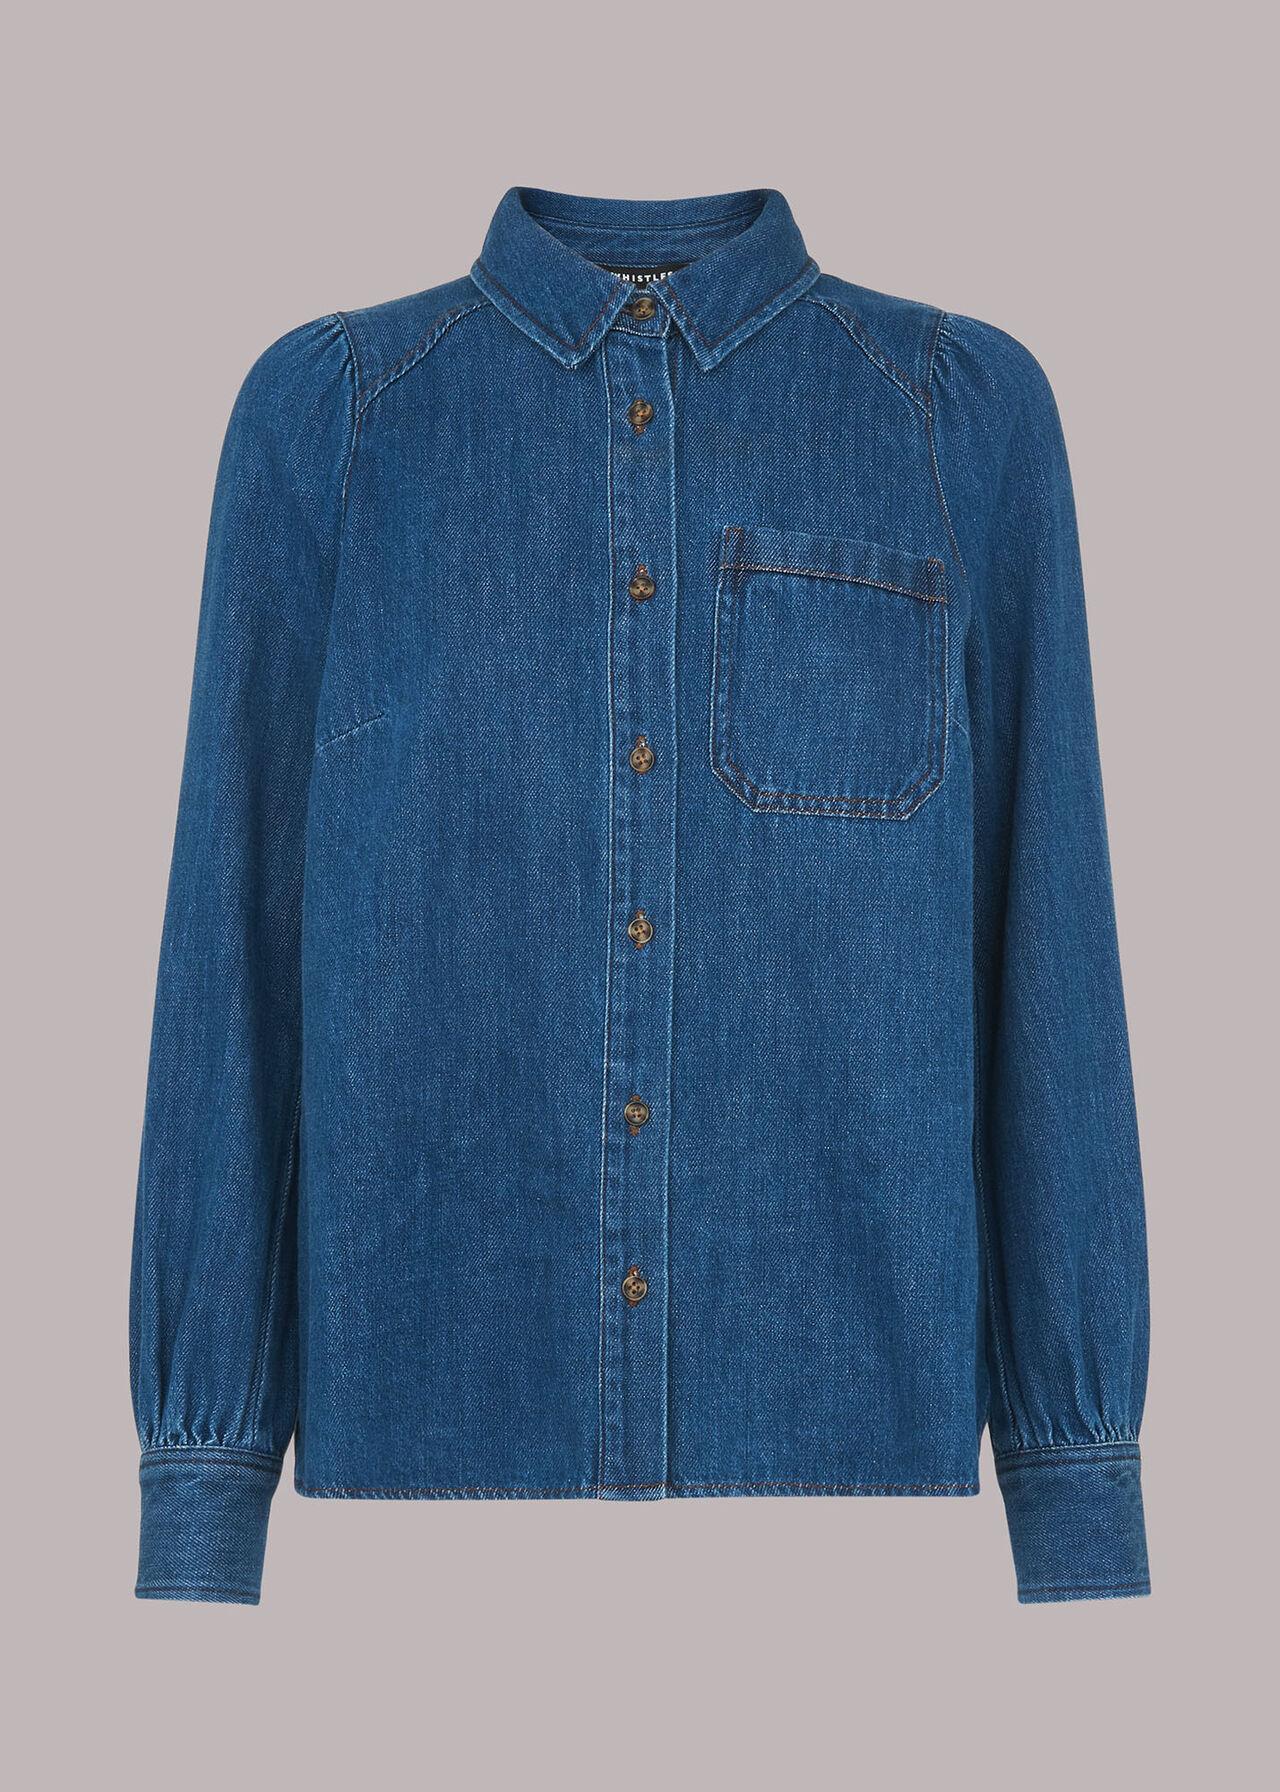 Puff Sleeve Detail Denim Shirt